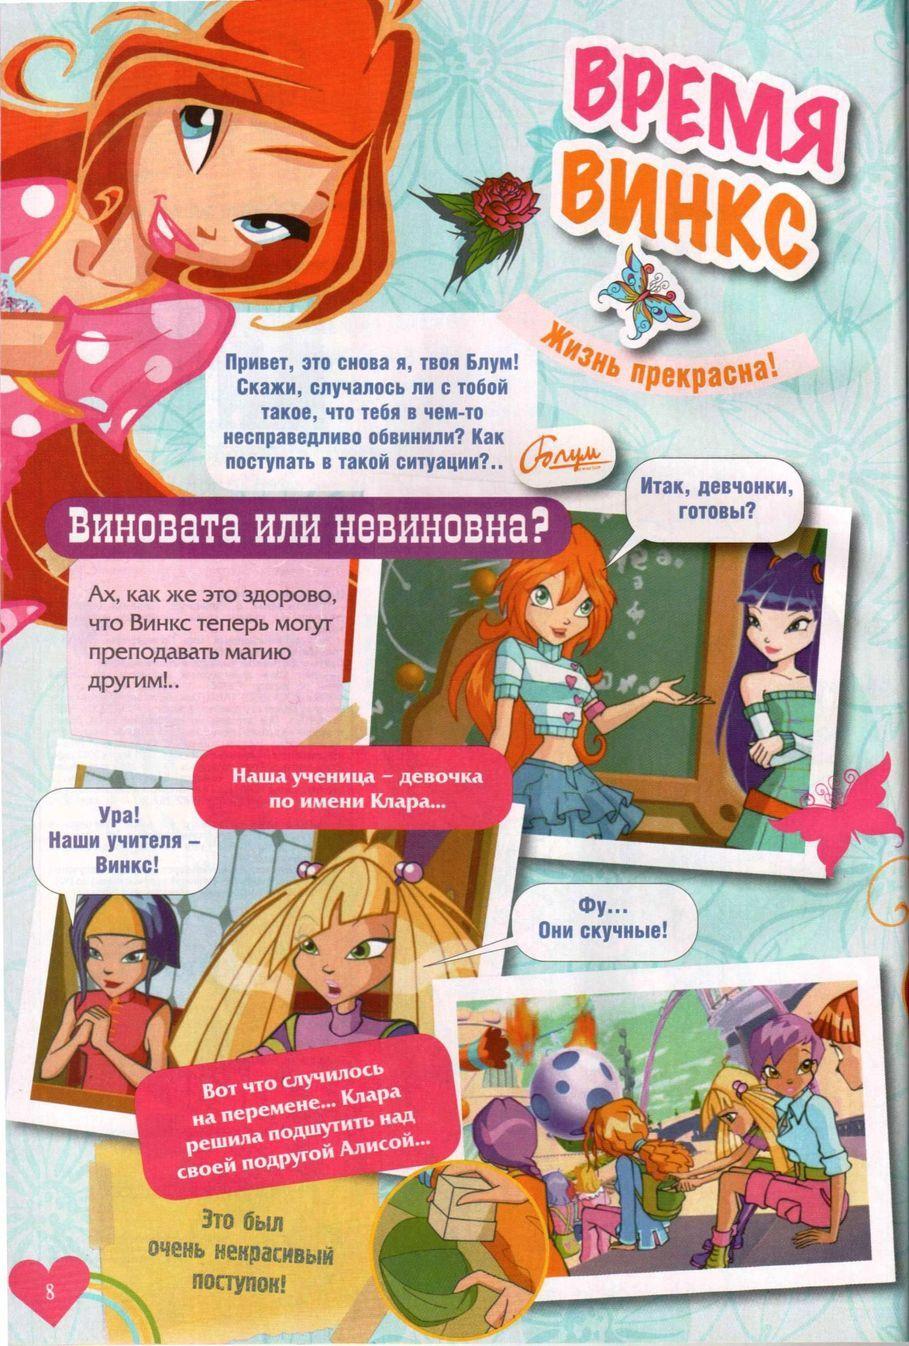 Комикс Винкс Winx - Опасный замысел (Журнал Винкс №10 2011) - стр. 8